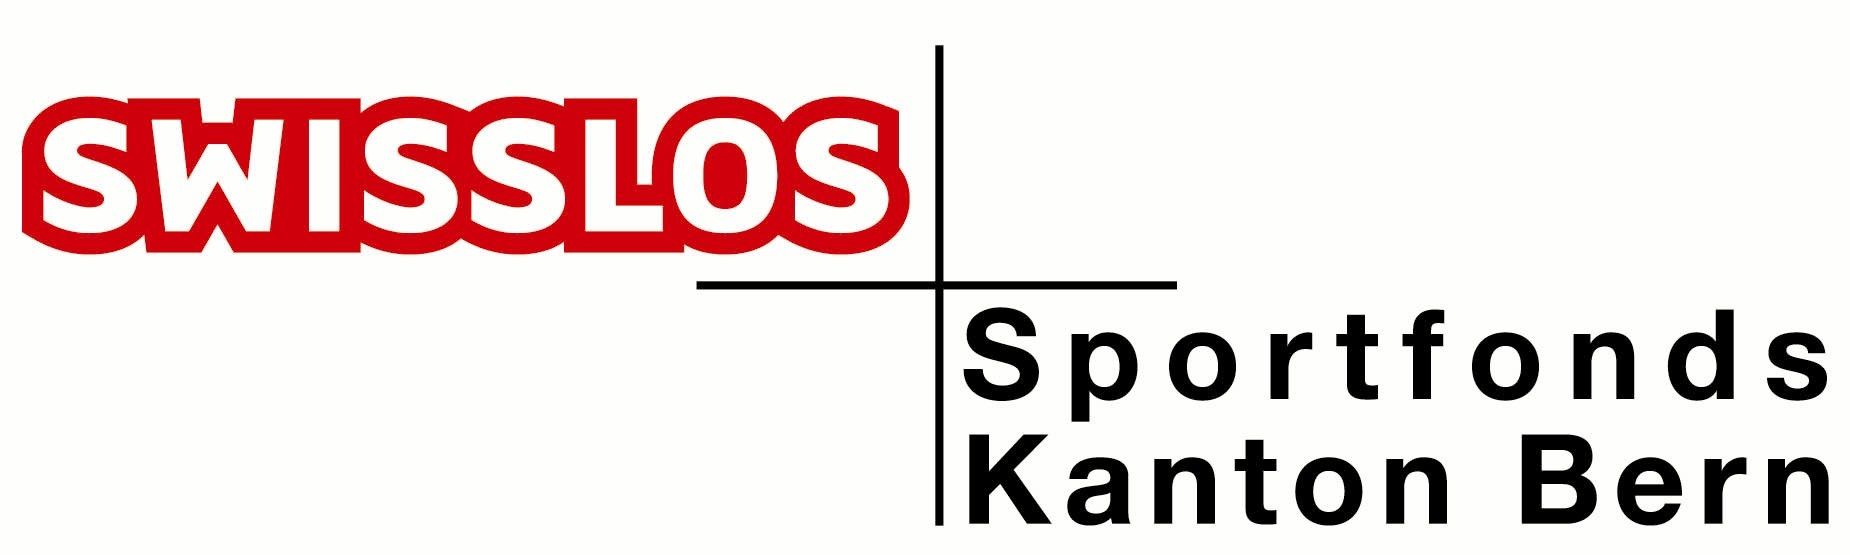 Sportfonds Kanton Bern